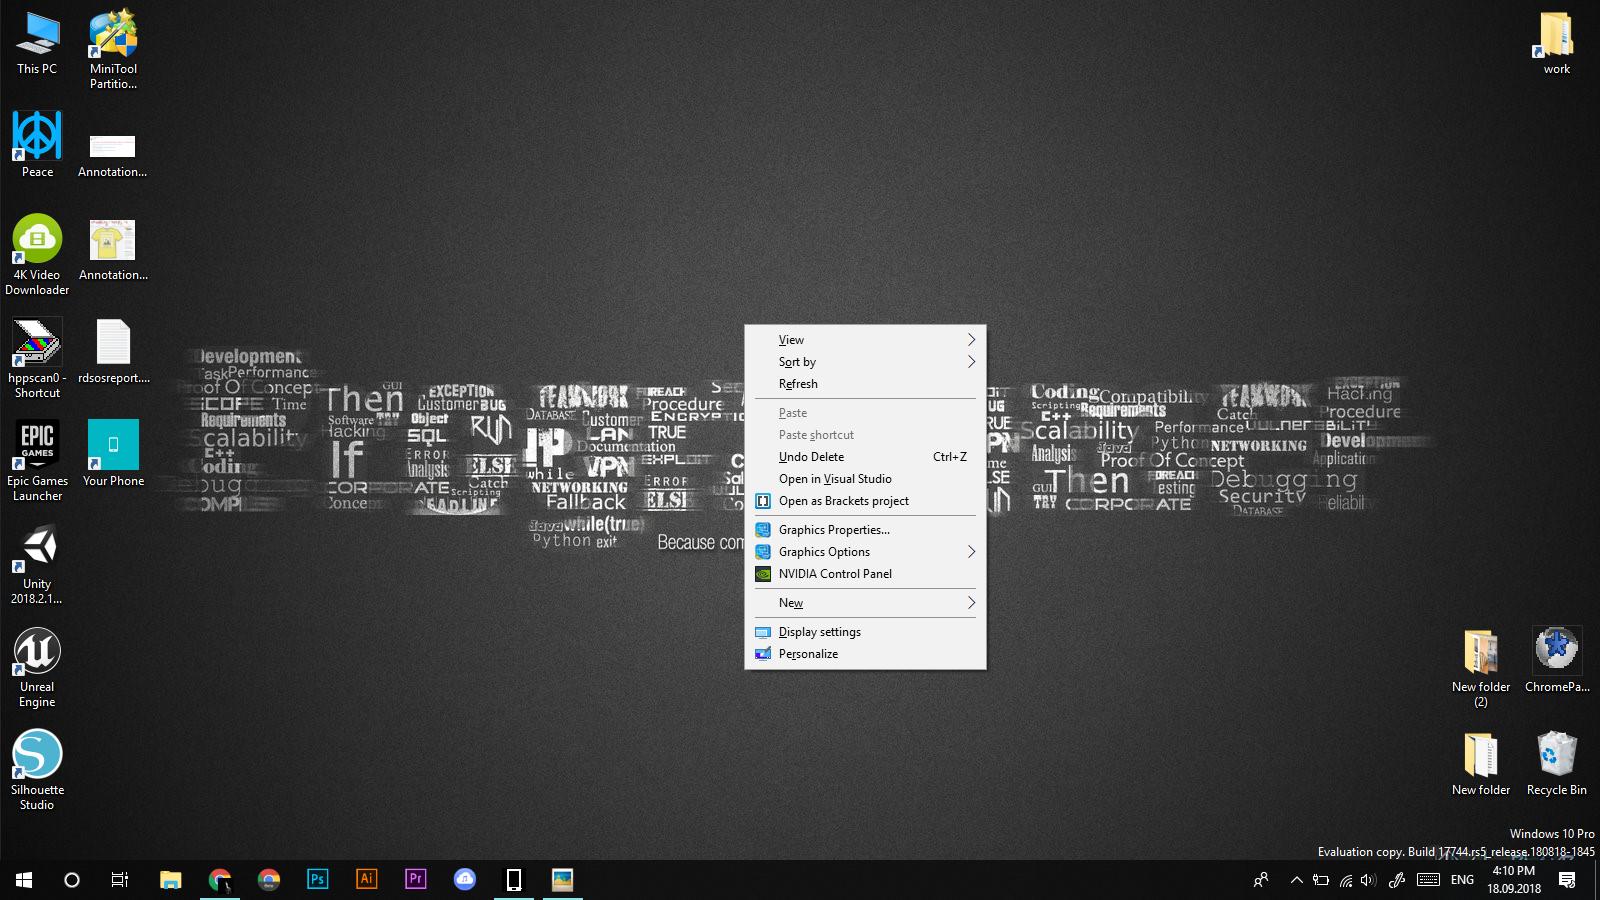 microsoft word in windows 10 pro